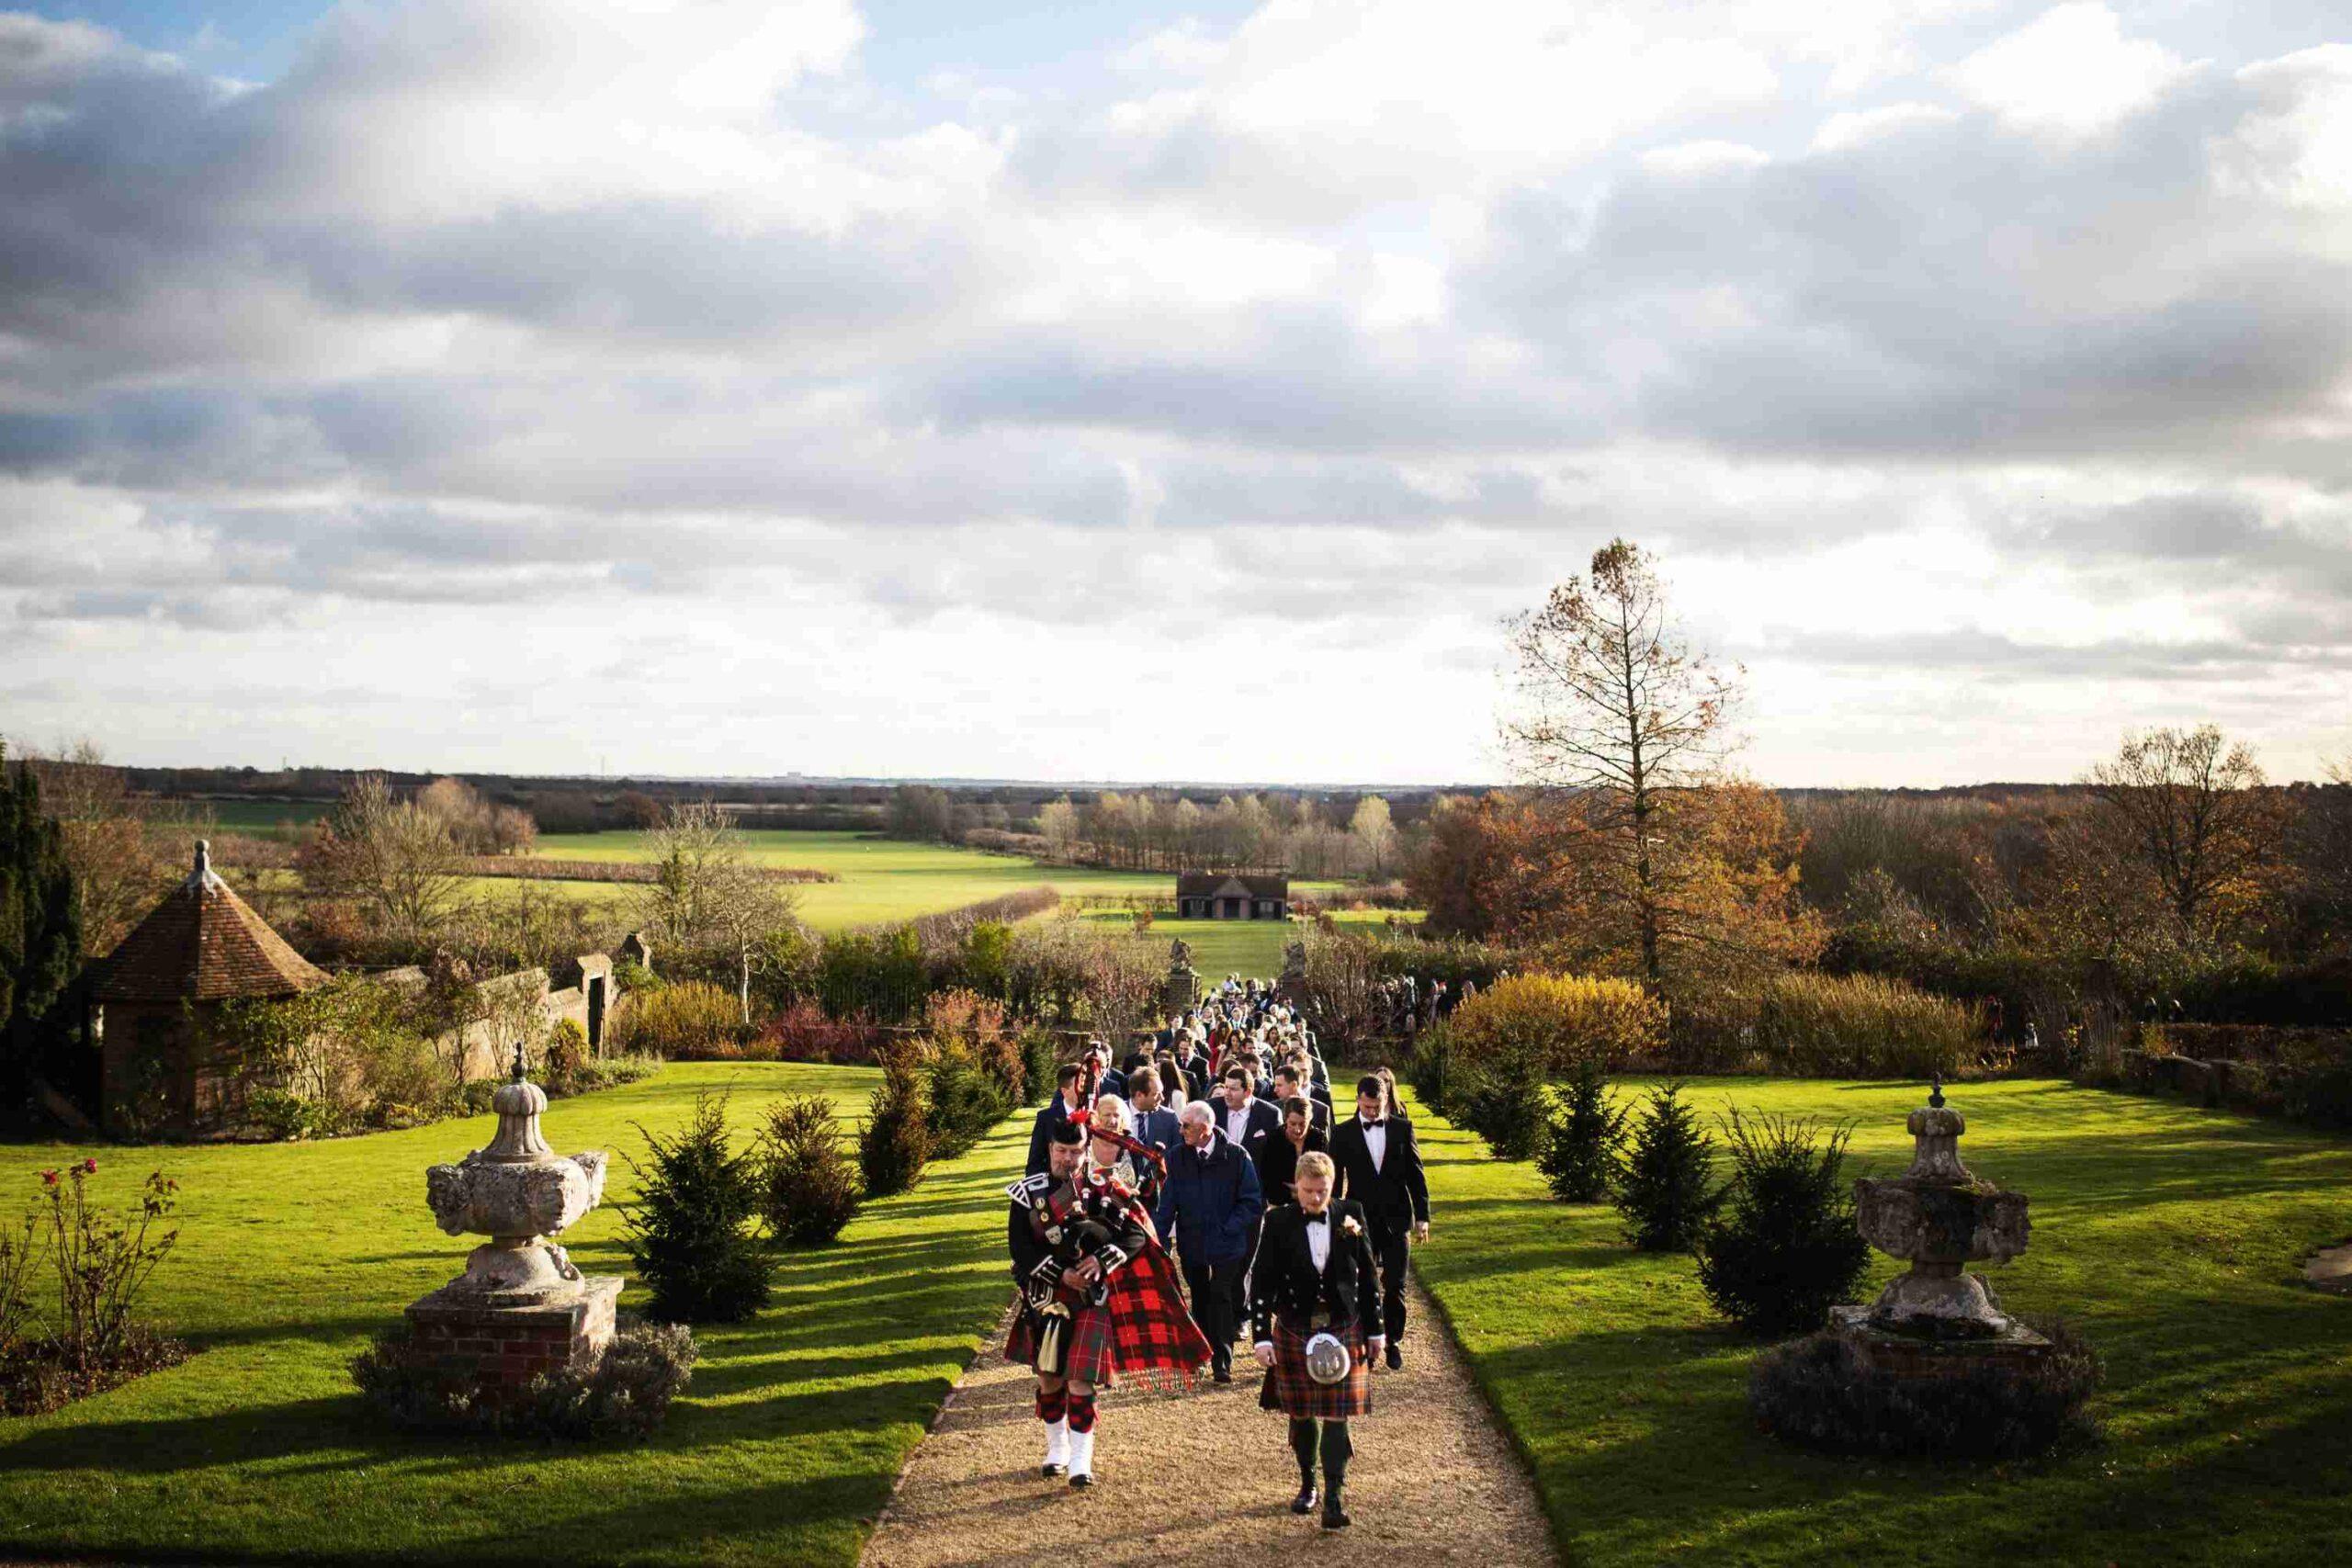 Wedding party in garden during November